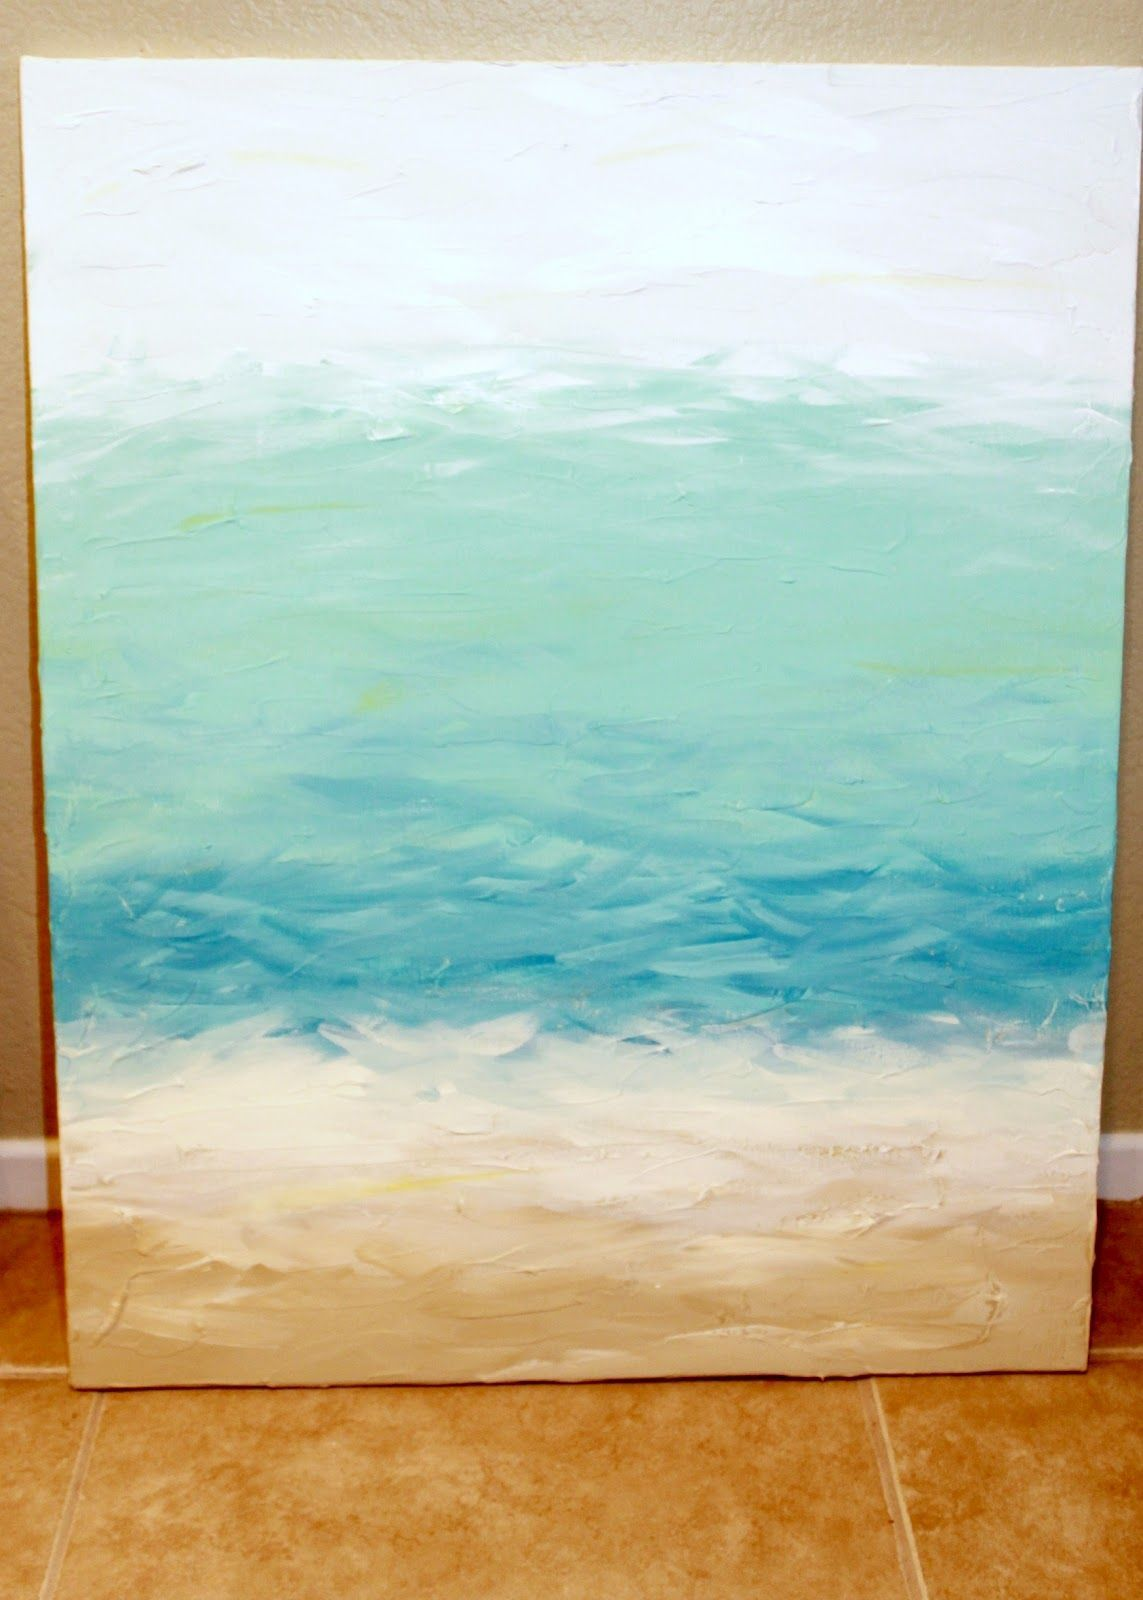 Diy painting canvas idea